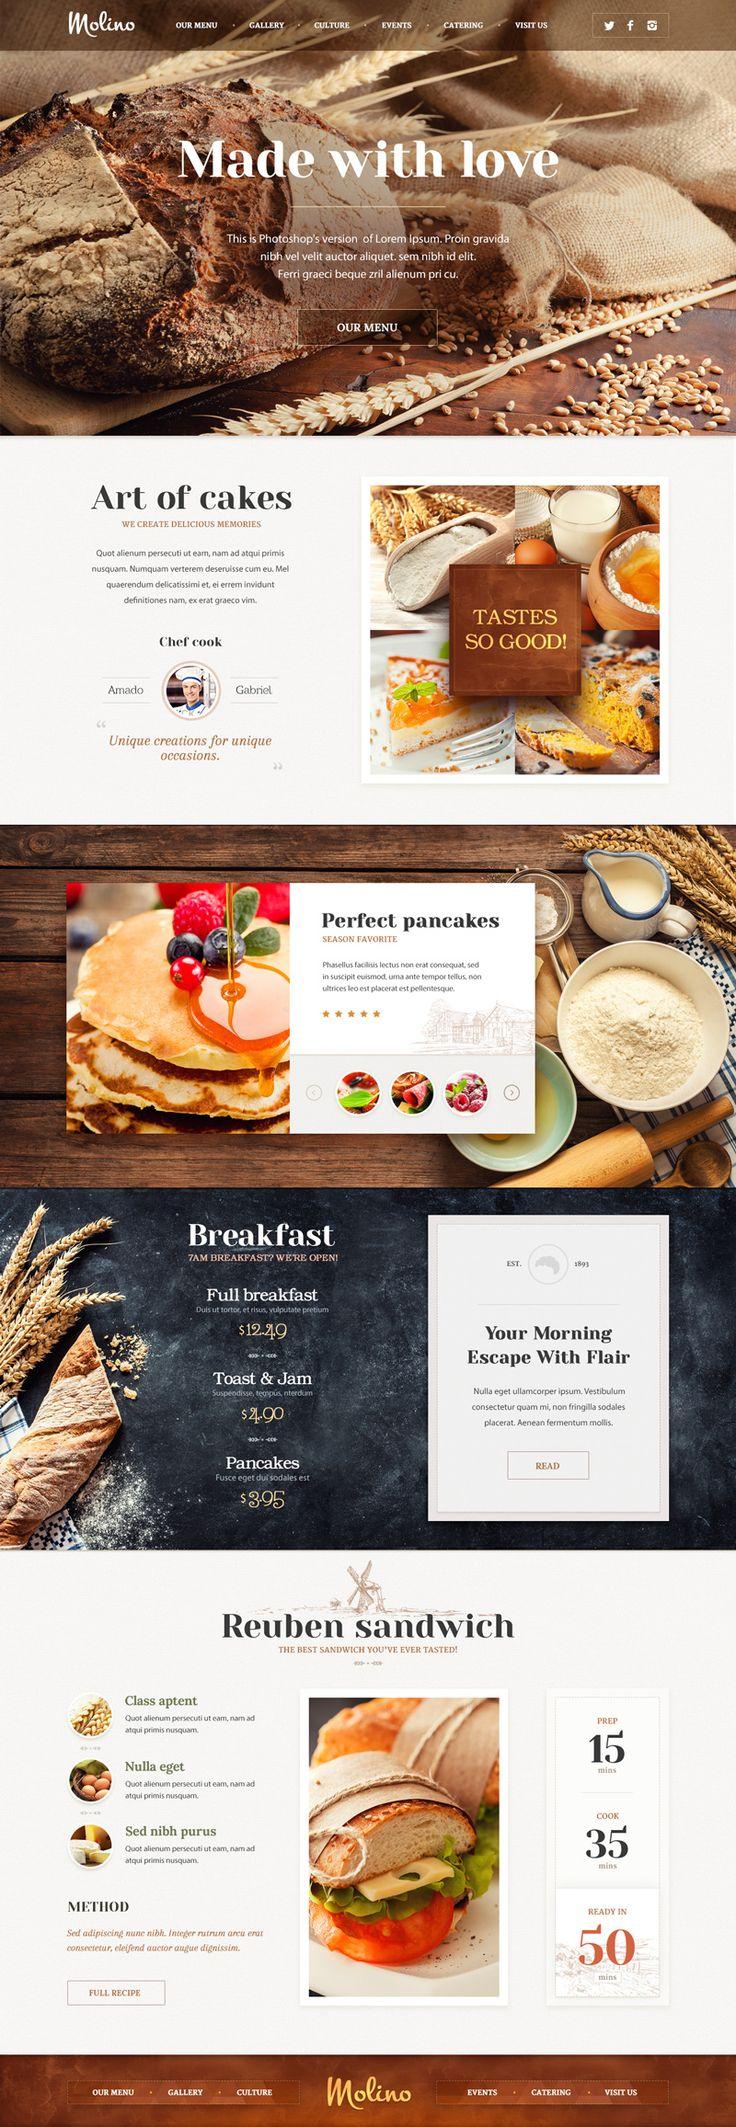 Molino Concept Bakery Website